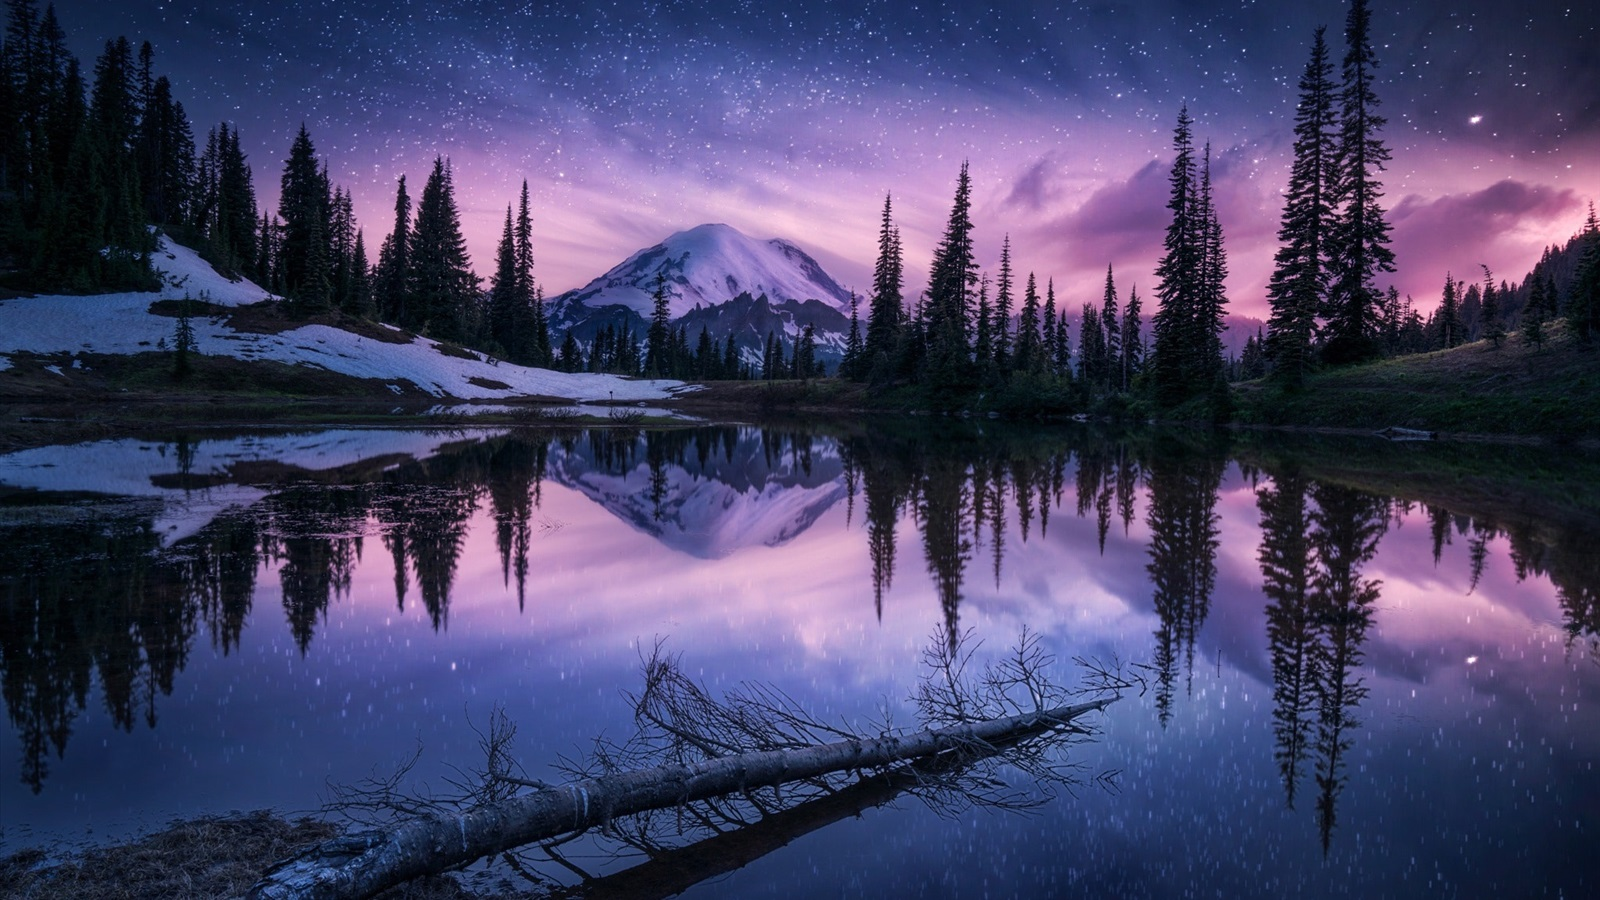 1600x900 hd desktop wallpaper winter - photo #26